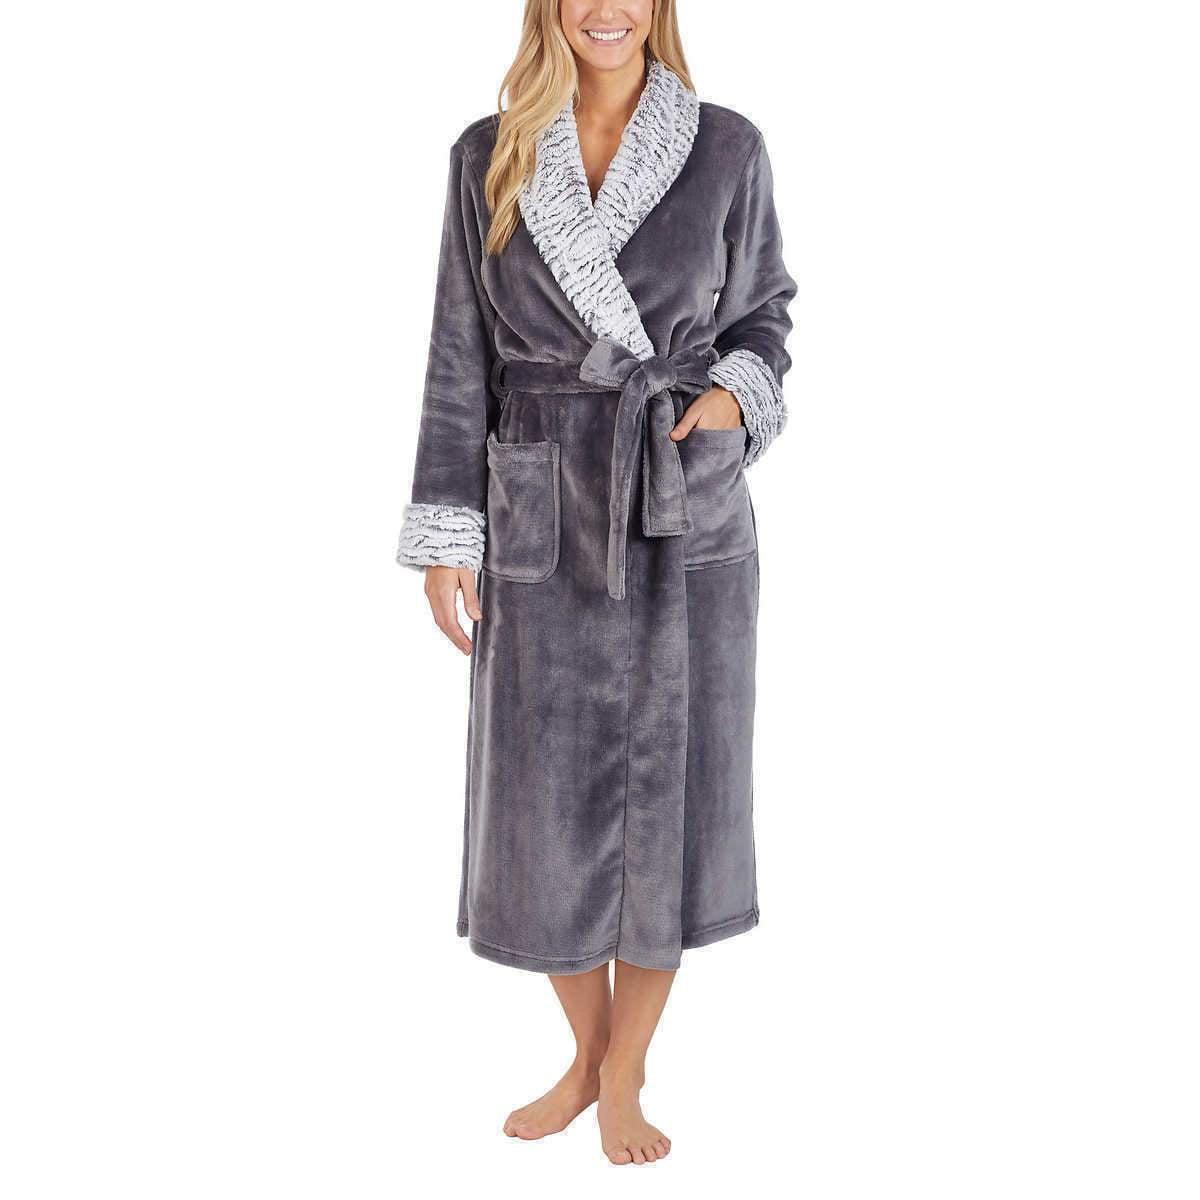 NWD Carole Hochman Ladies/' Plush Wrap Robe Color Ivory Size 2XL XXL